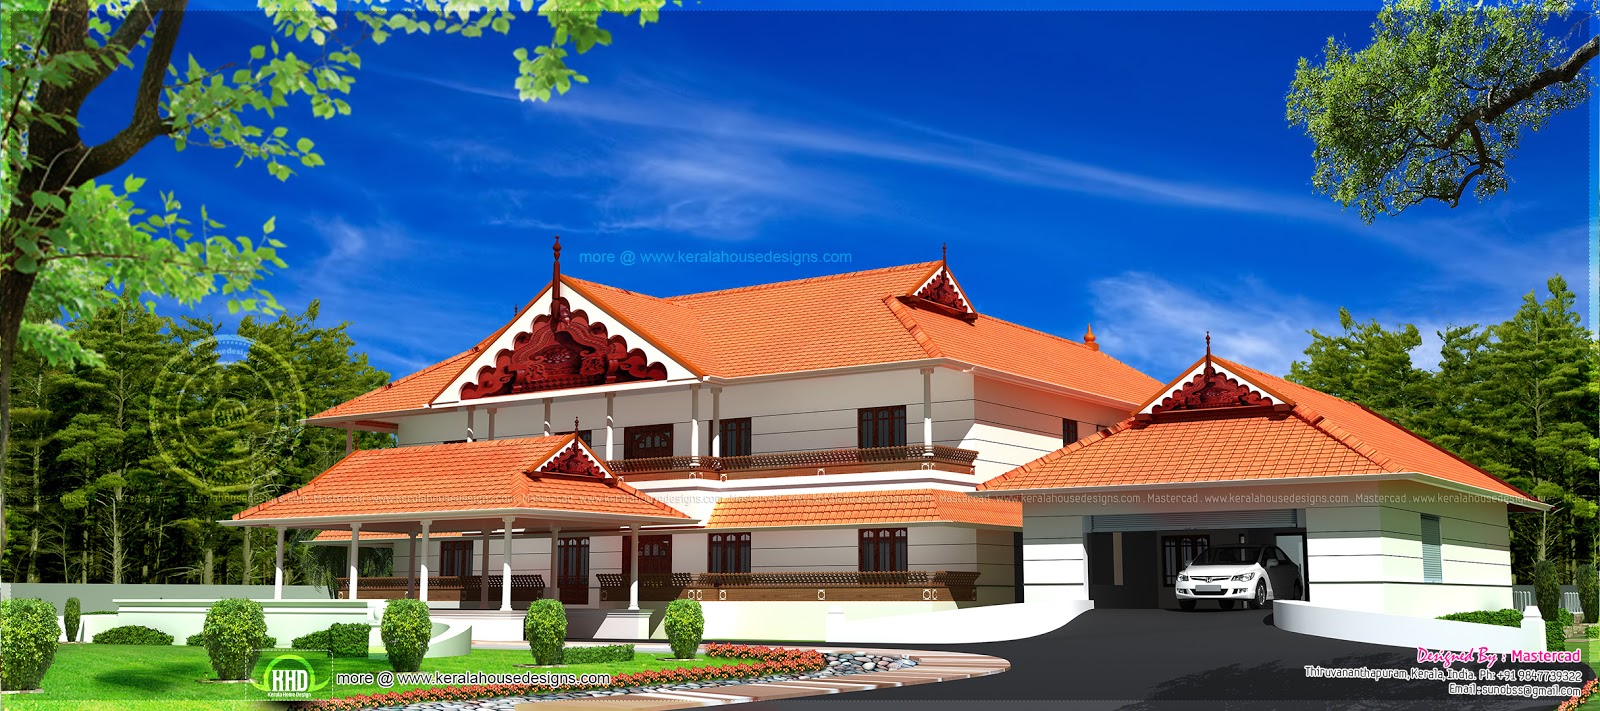 Kerala Style Super Luxury House Kerala Home Design And